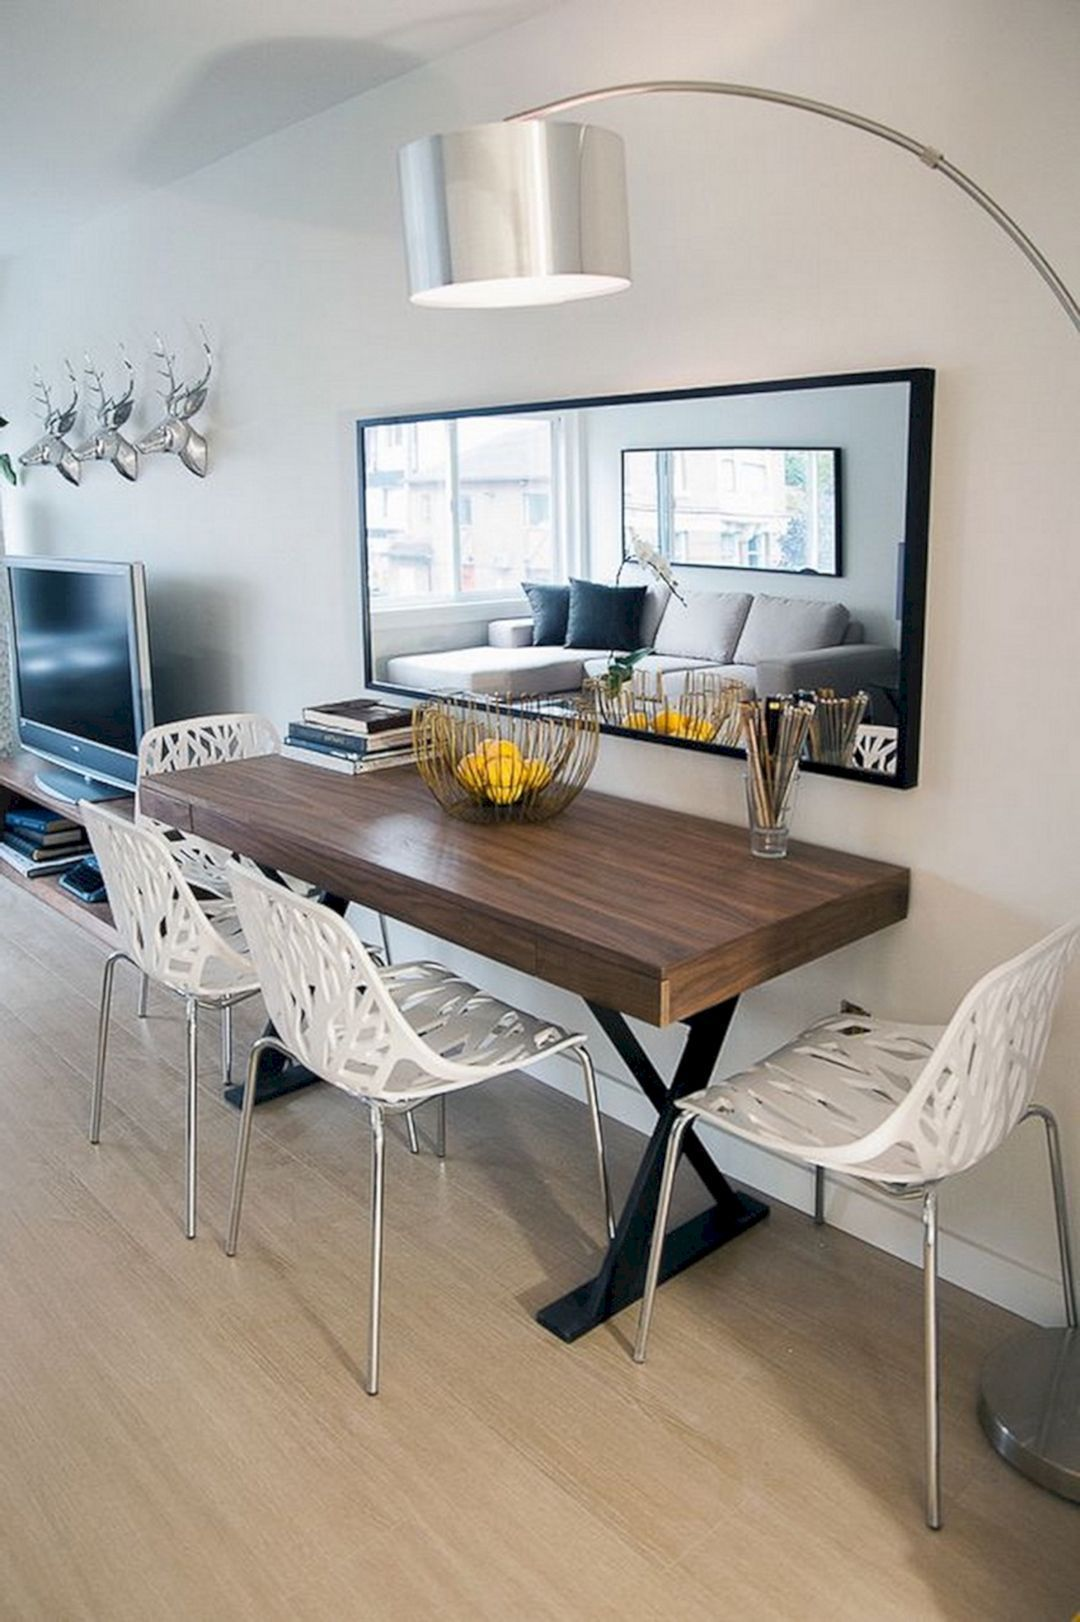 75 Simple And Minimalist Dining Table Decor Ideas 25069 Apartment Dining Room Dining Room Small Apartment Dining